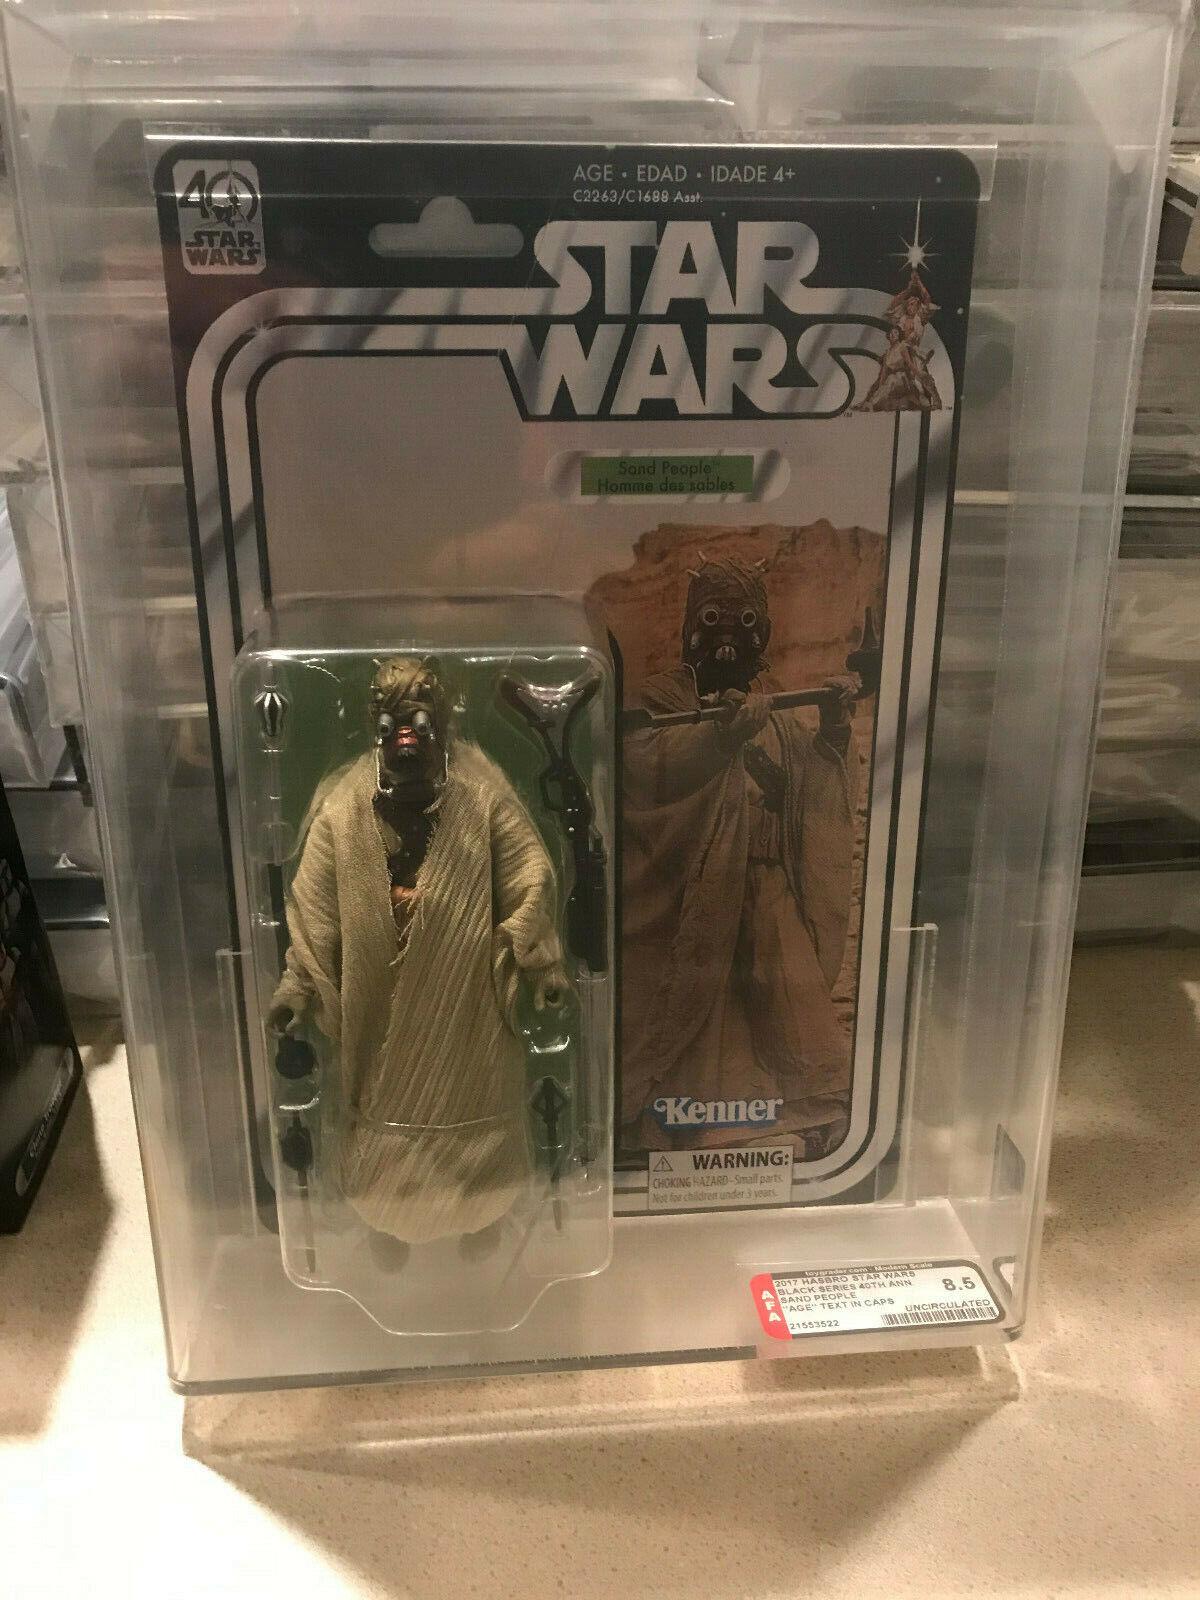 Star Wars Black Series 40th Anniversaire Wave 3 ep. 5 ESB Snowtrooper